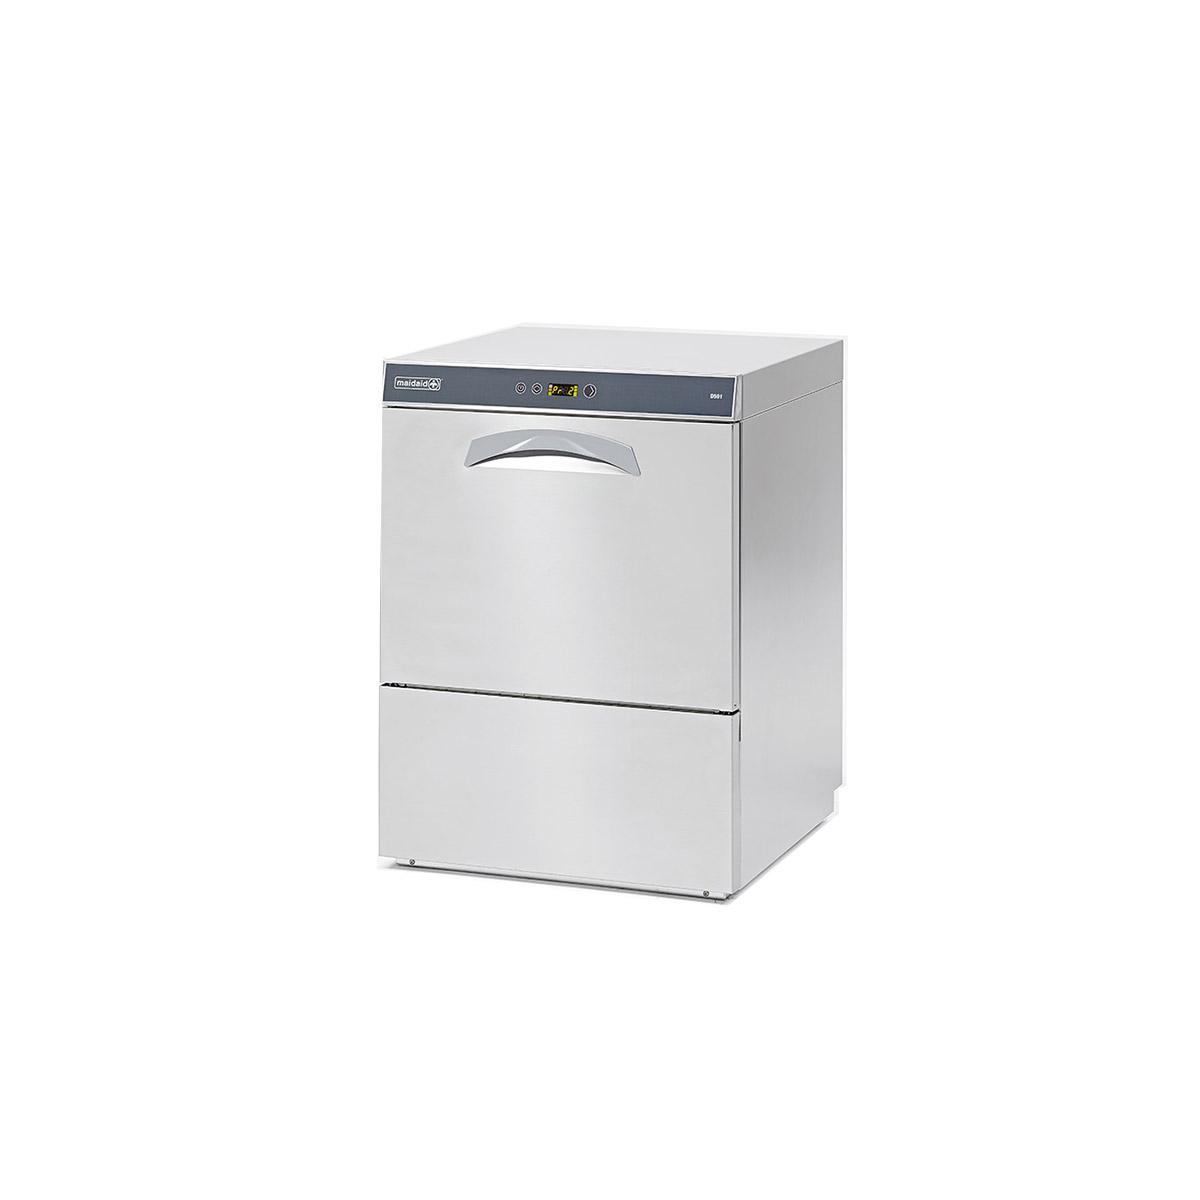 Maidaid Halcyon Dishwasher D501